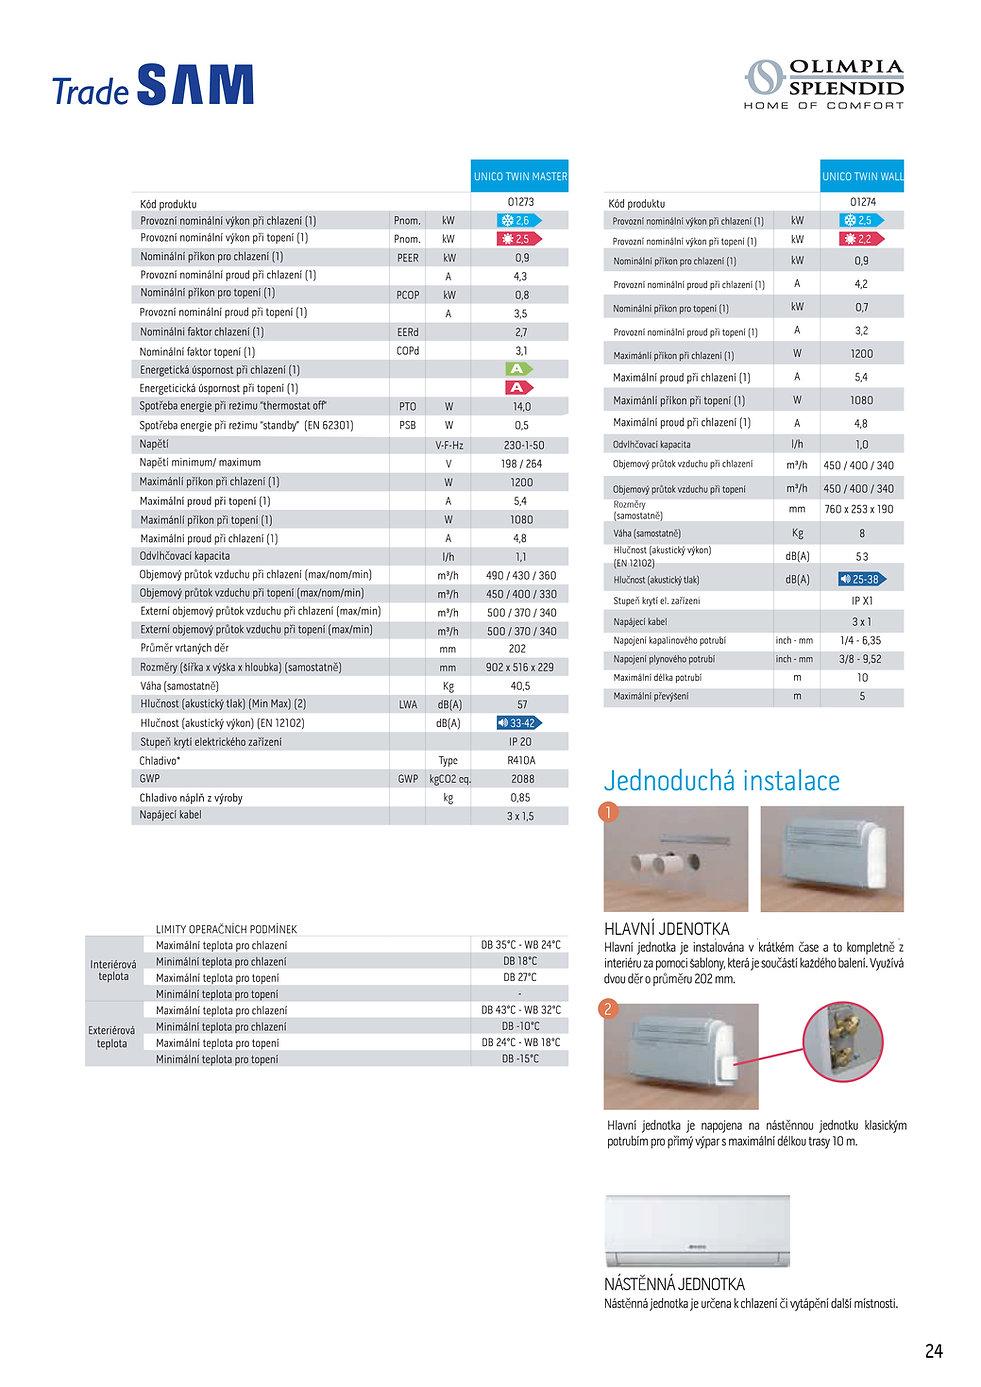 Katalog Unico 2021 Tradesam-26.jpg